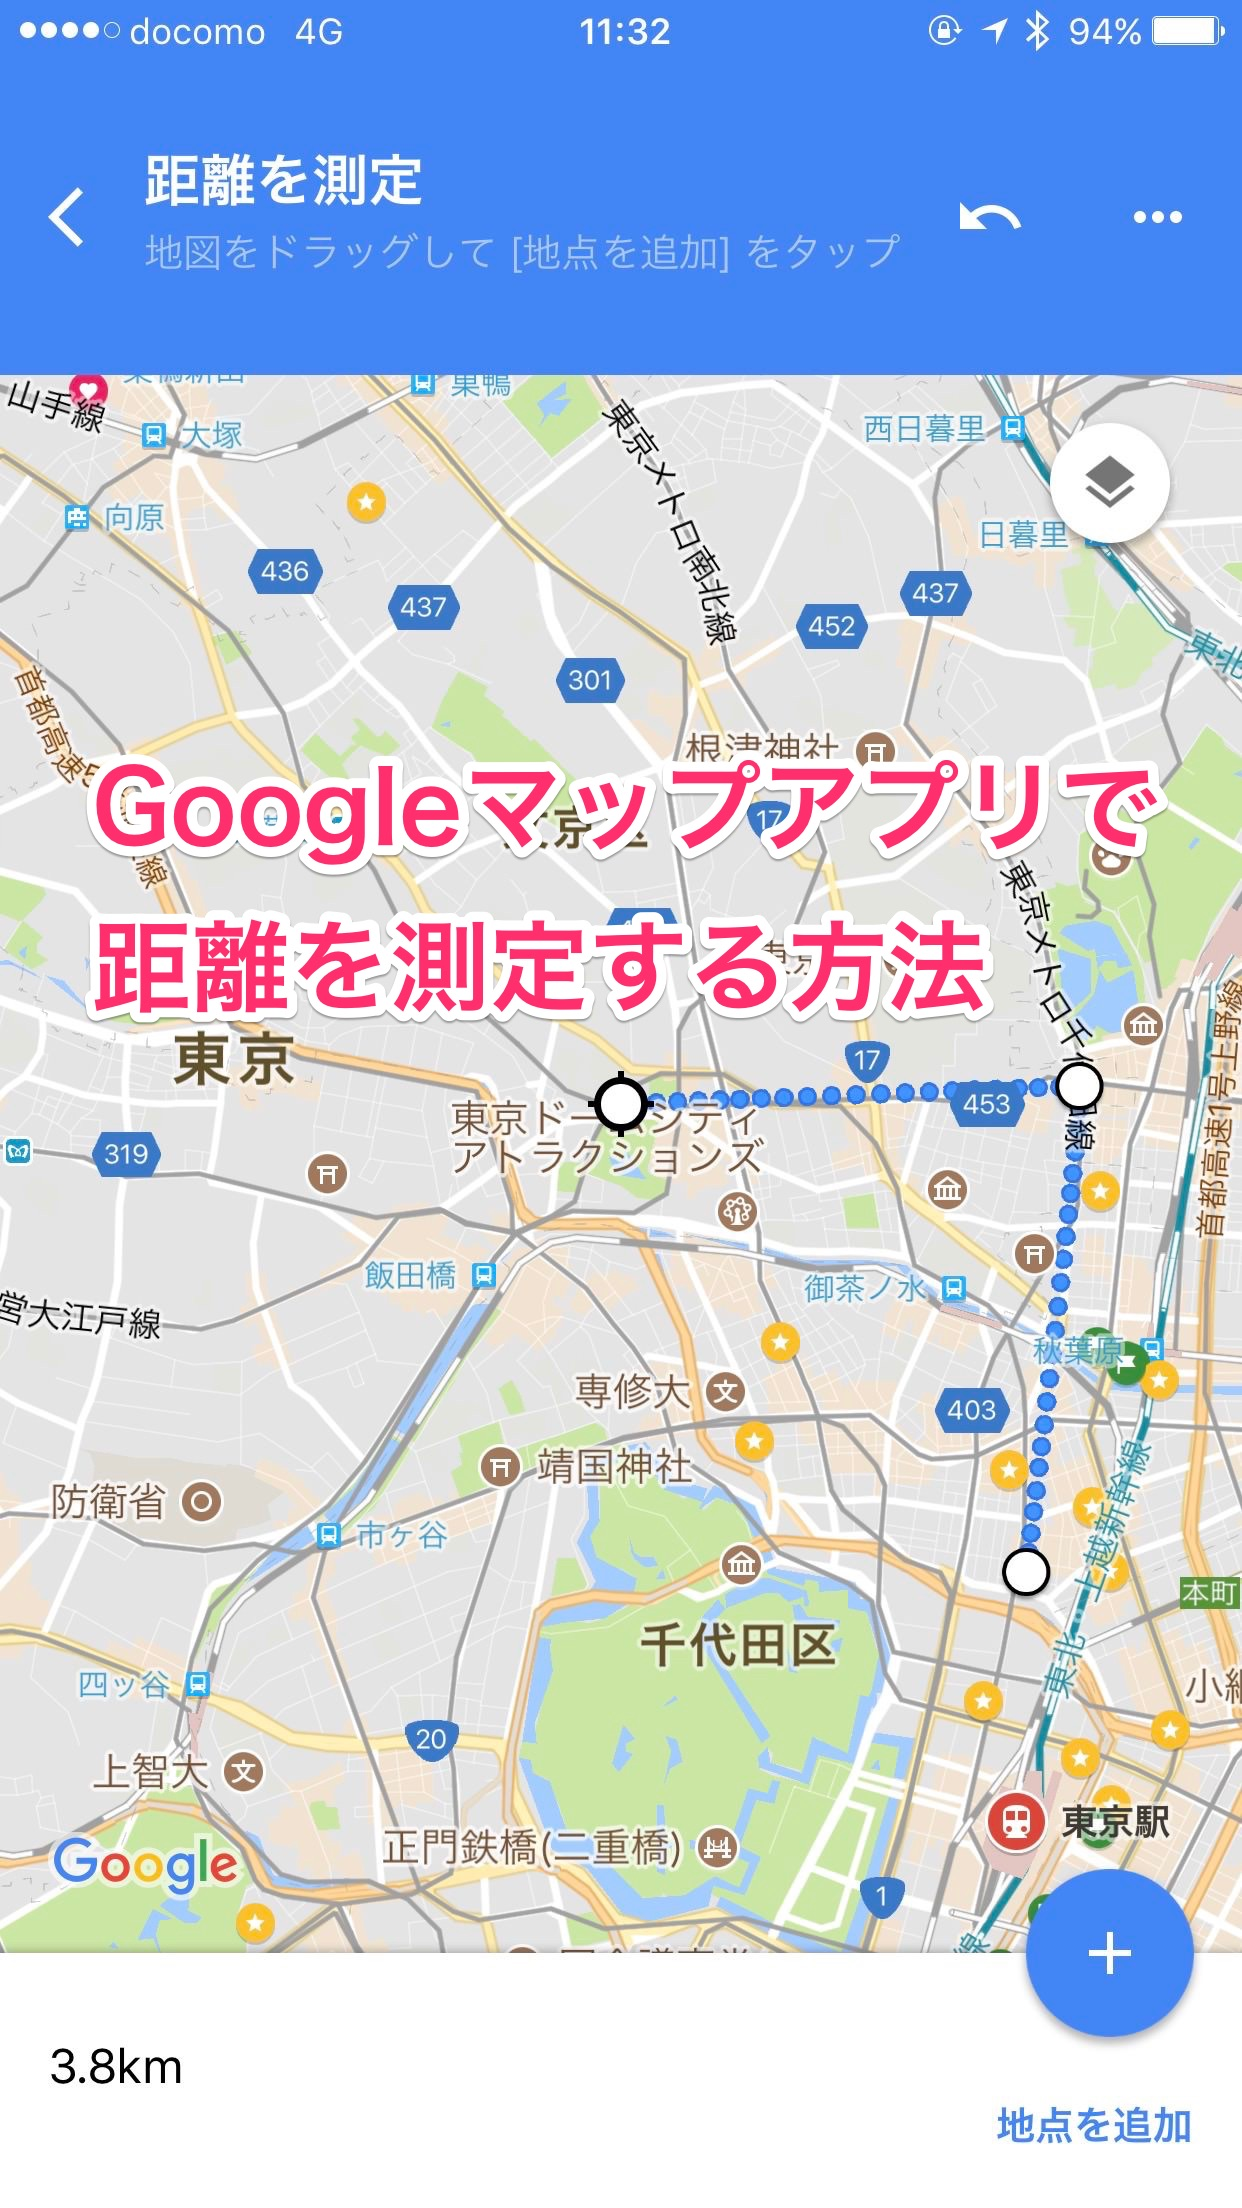 【Googleマップ】iOSアプリで距離の測定をする方法